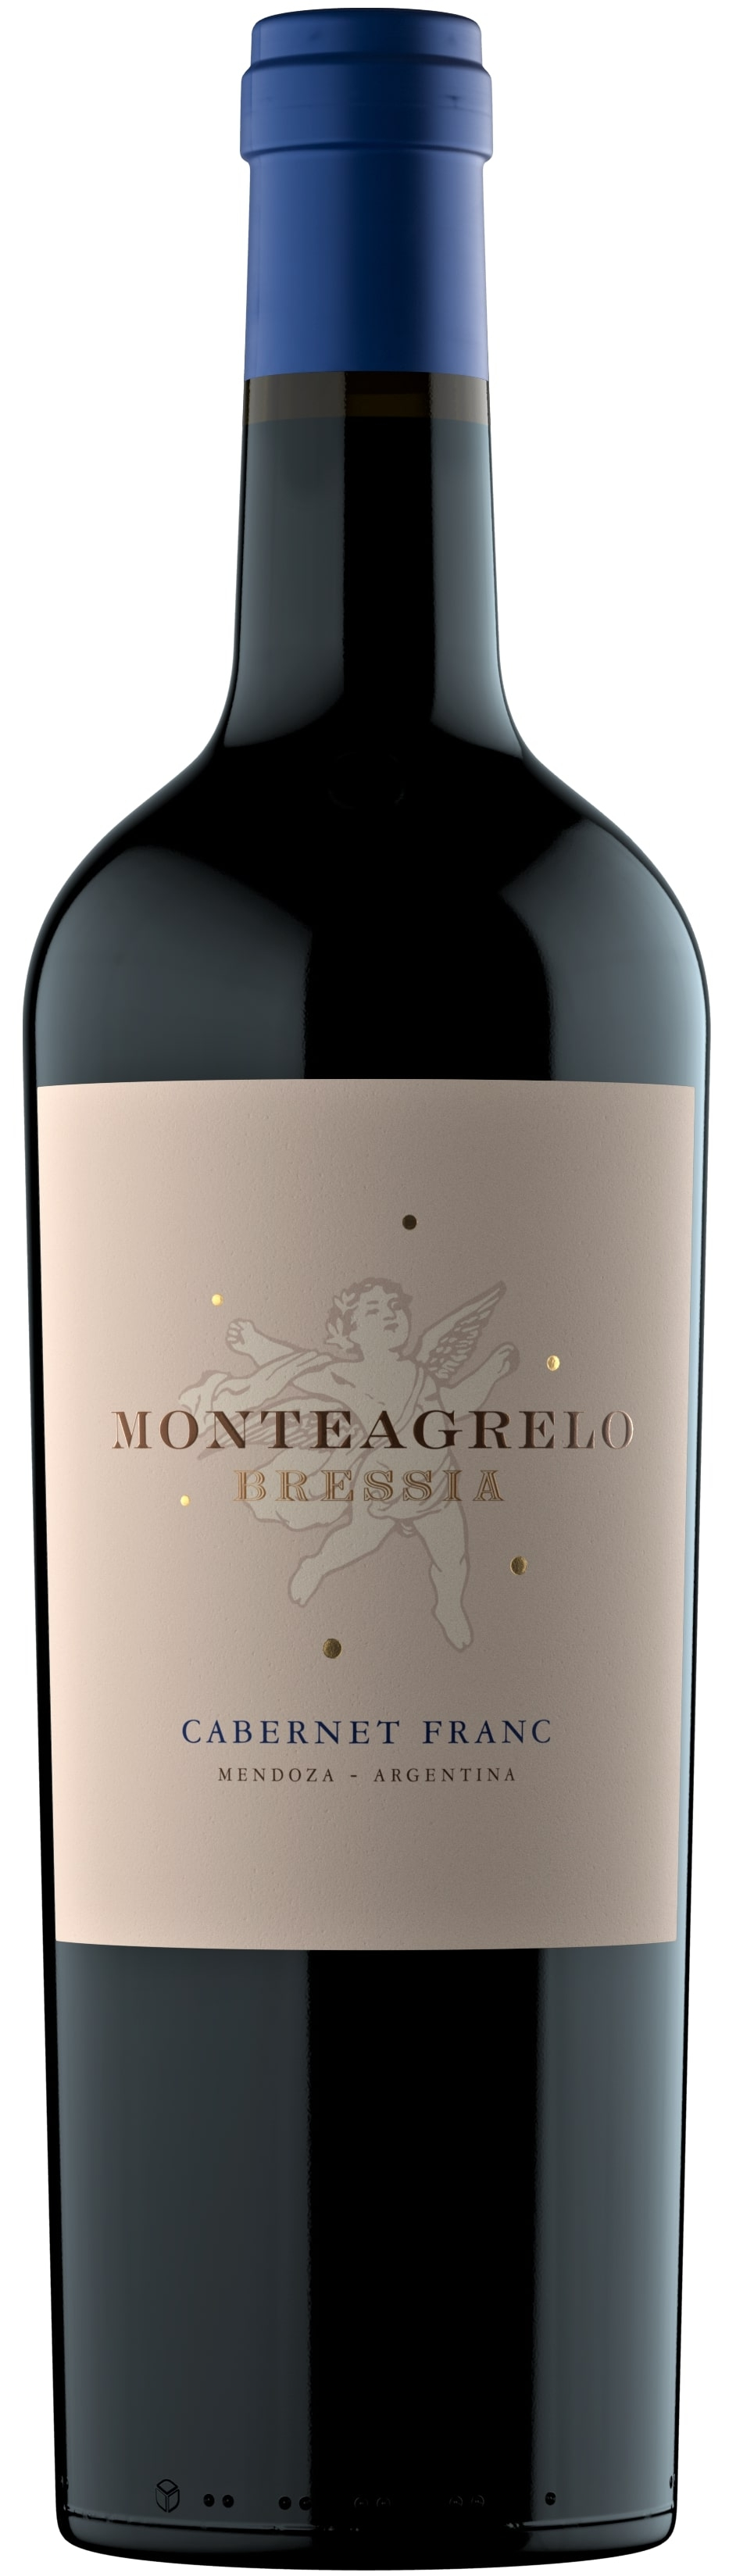 Caudalia wine Box Diciembre 2020 Cabernet Franc Argentina Bressia